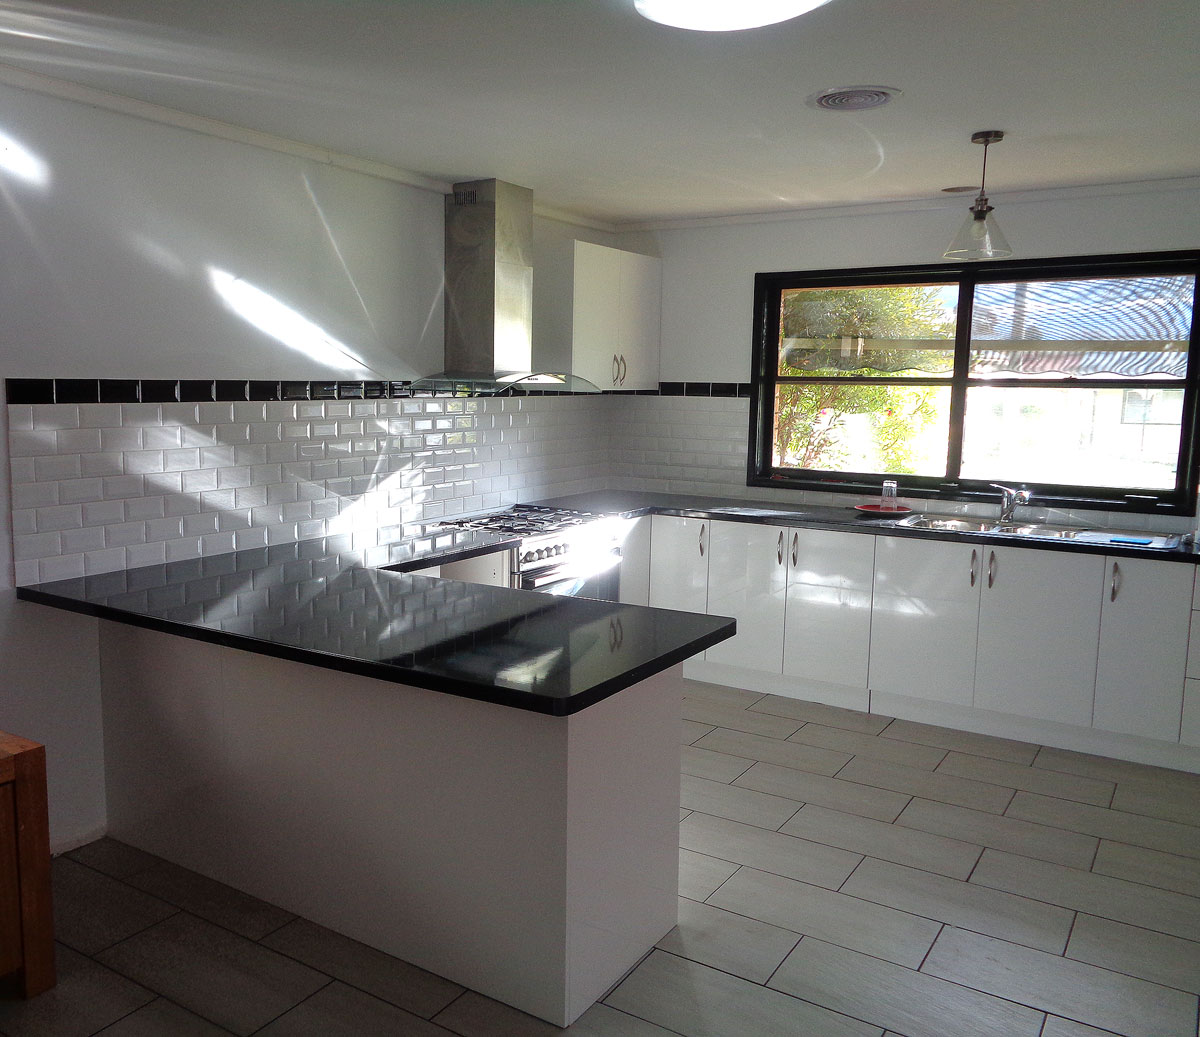 Kitchen Renovation Quotes: Bathurst Handyman,Handyman Bathurst, Bathurst Handyman